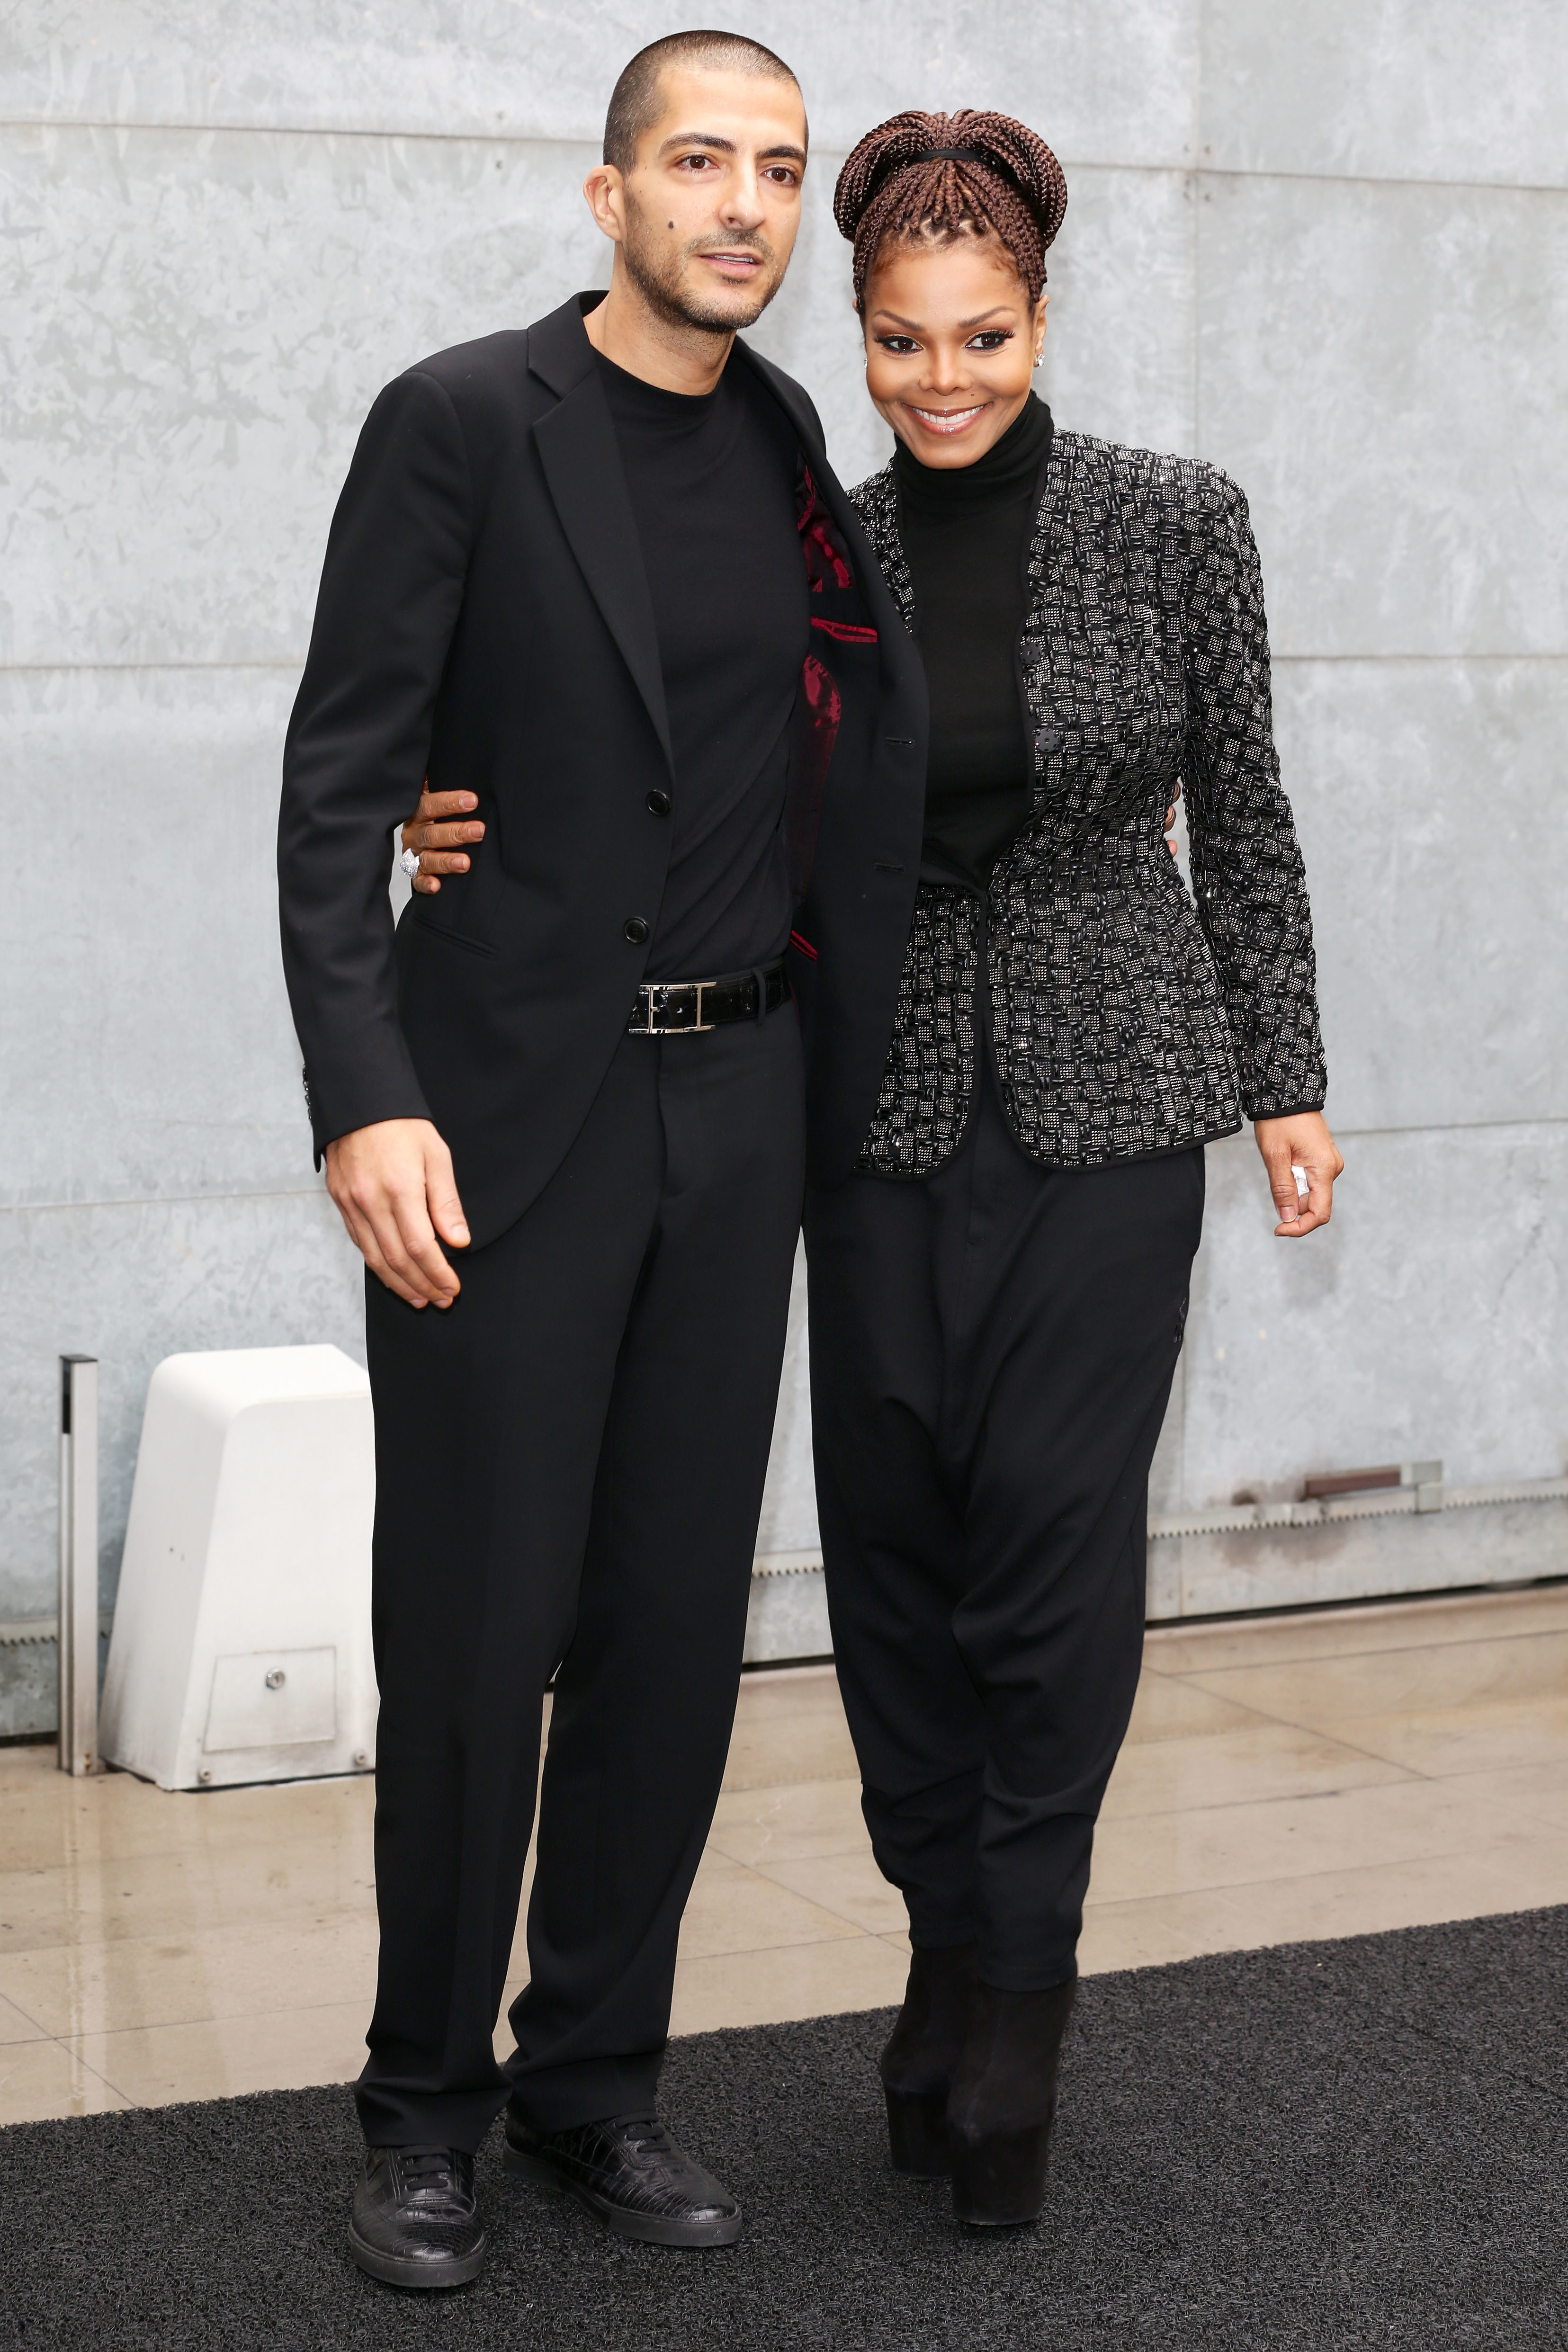 New details about Janet Jackson and Wissam Al Mana's split